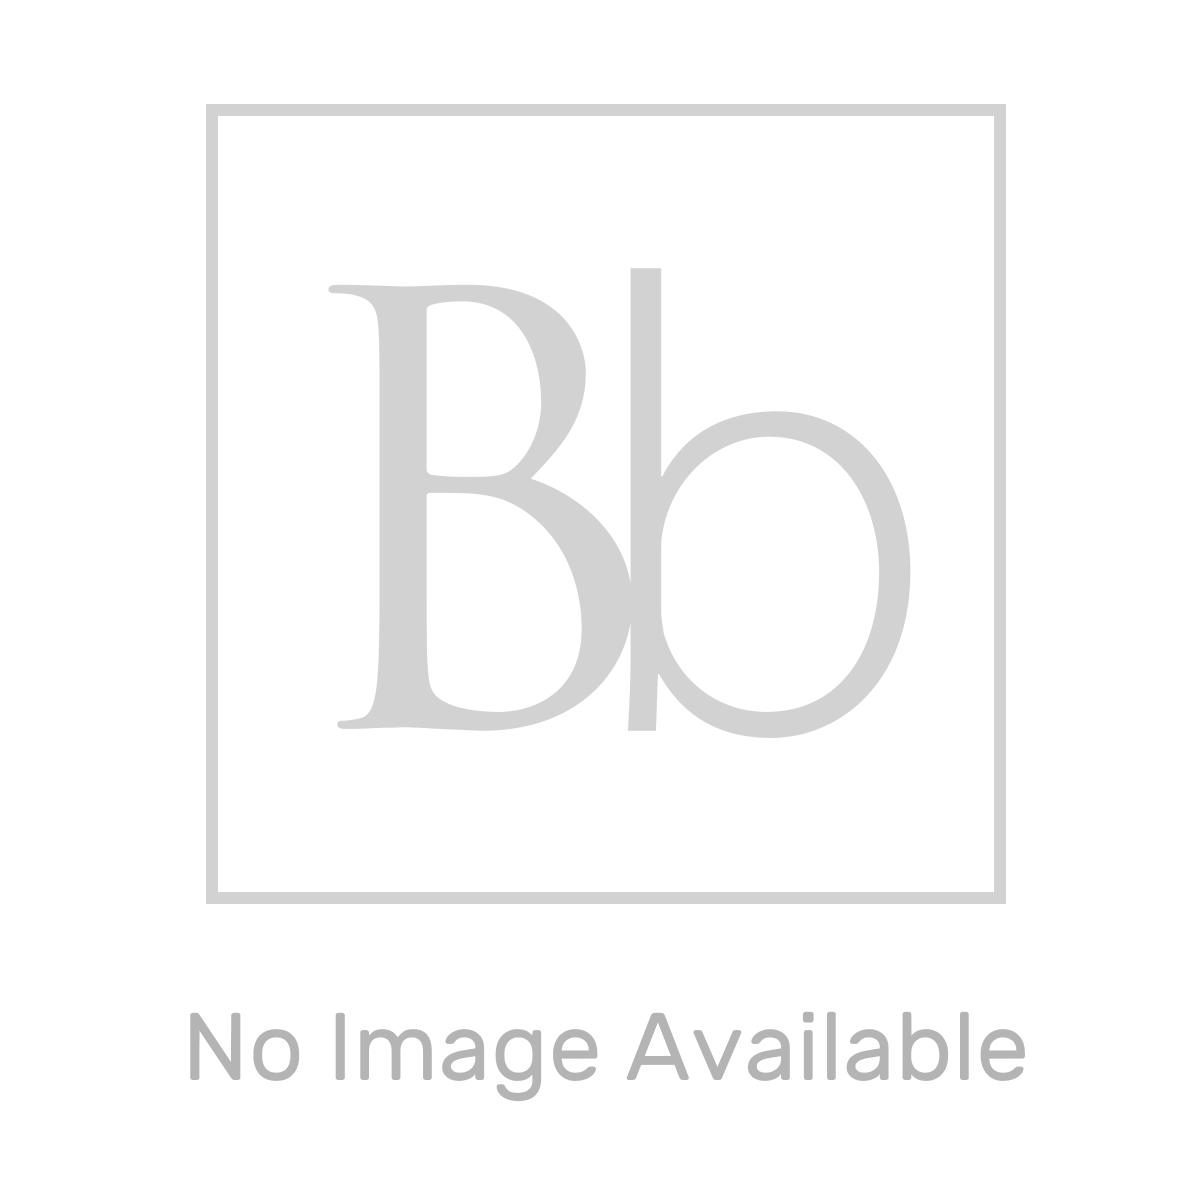 Aquadart Rectangular 900 x 760 Shower Tray